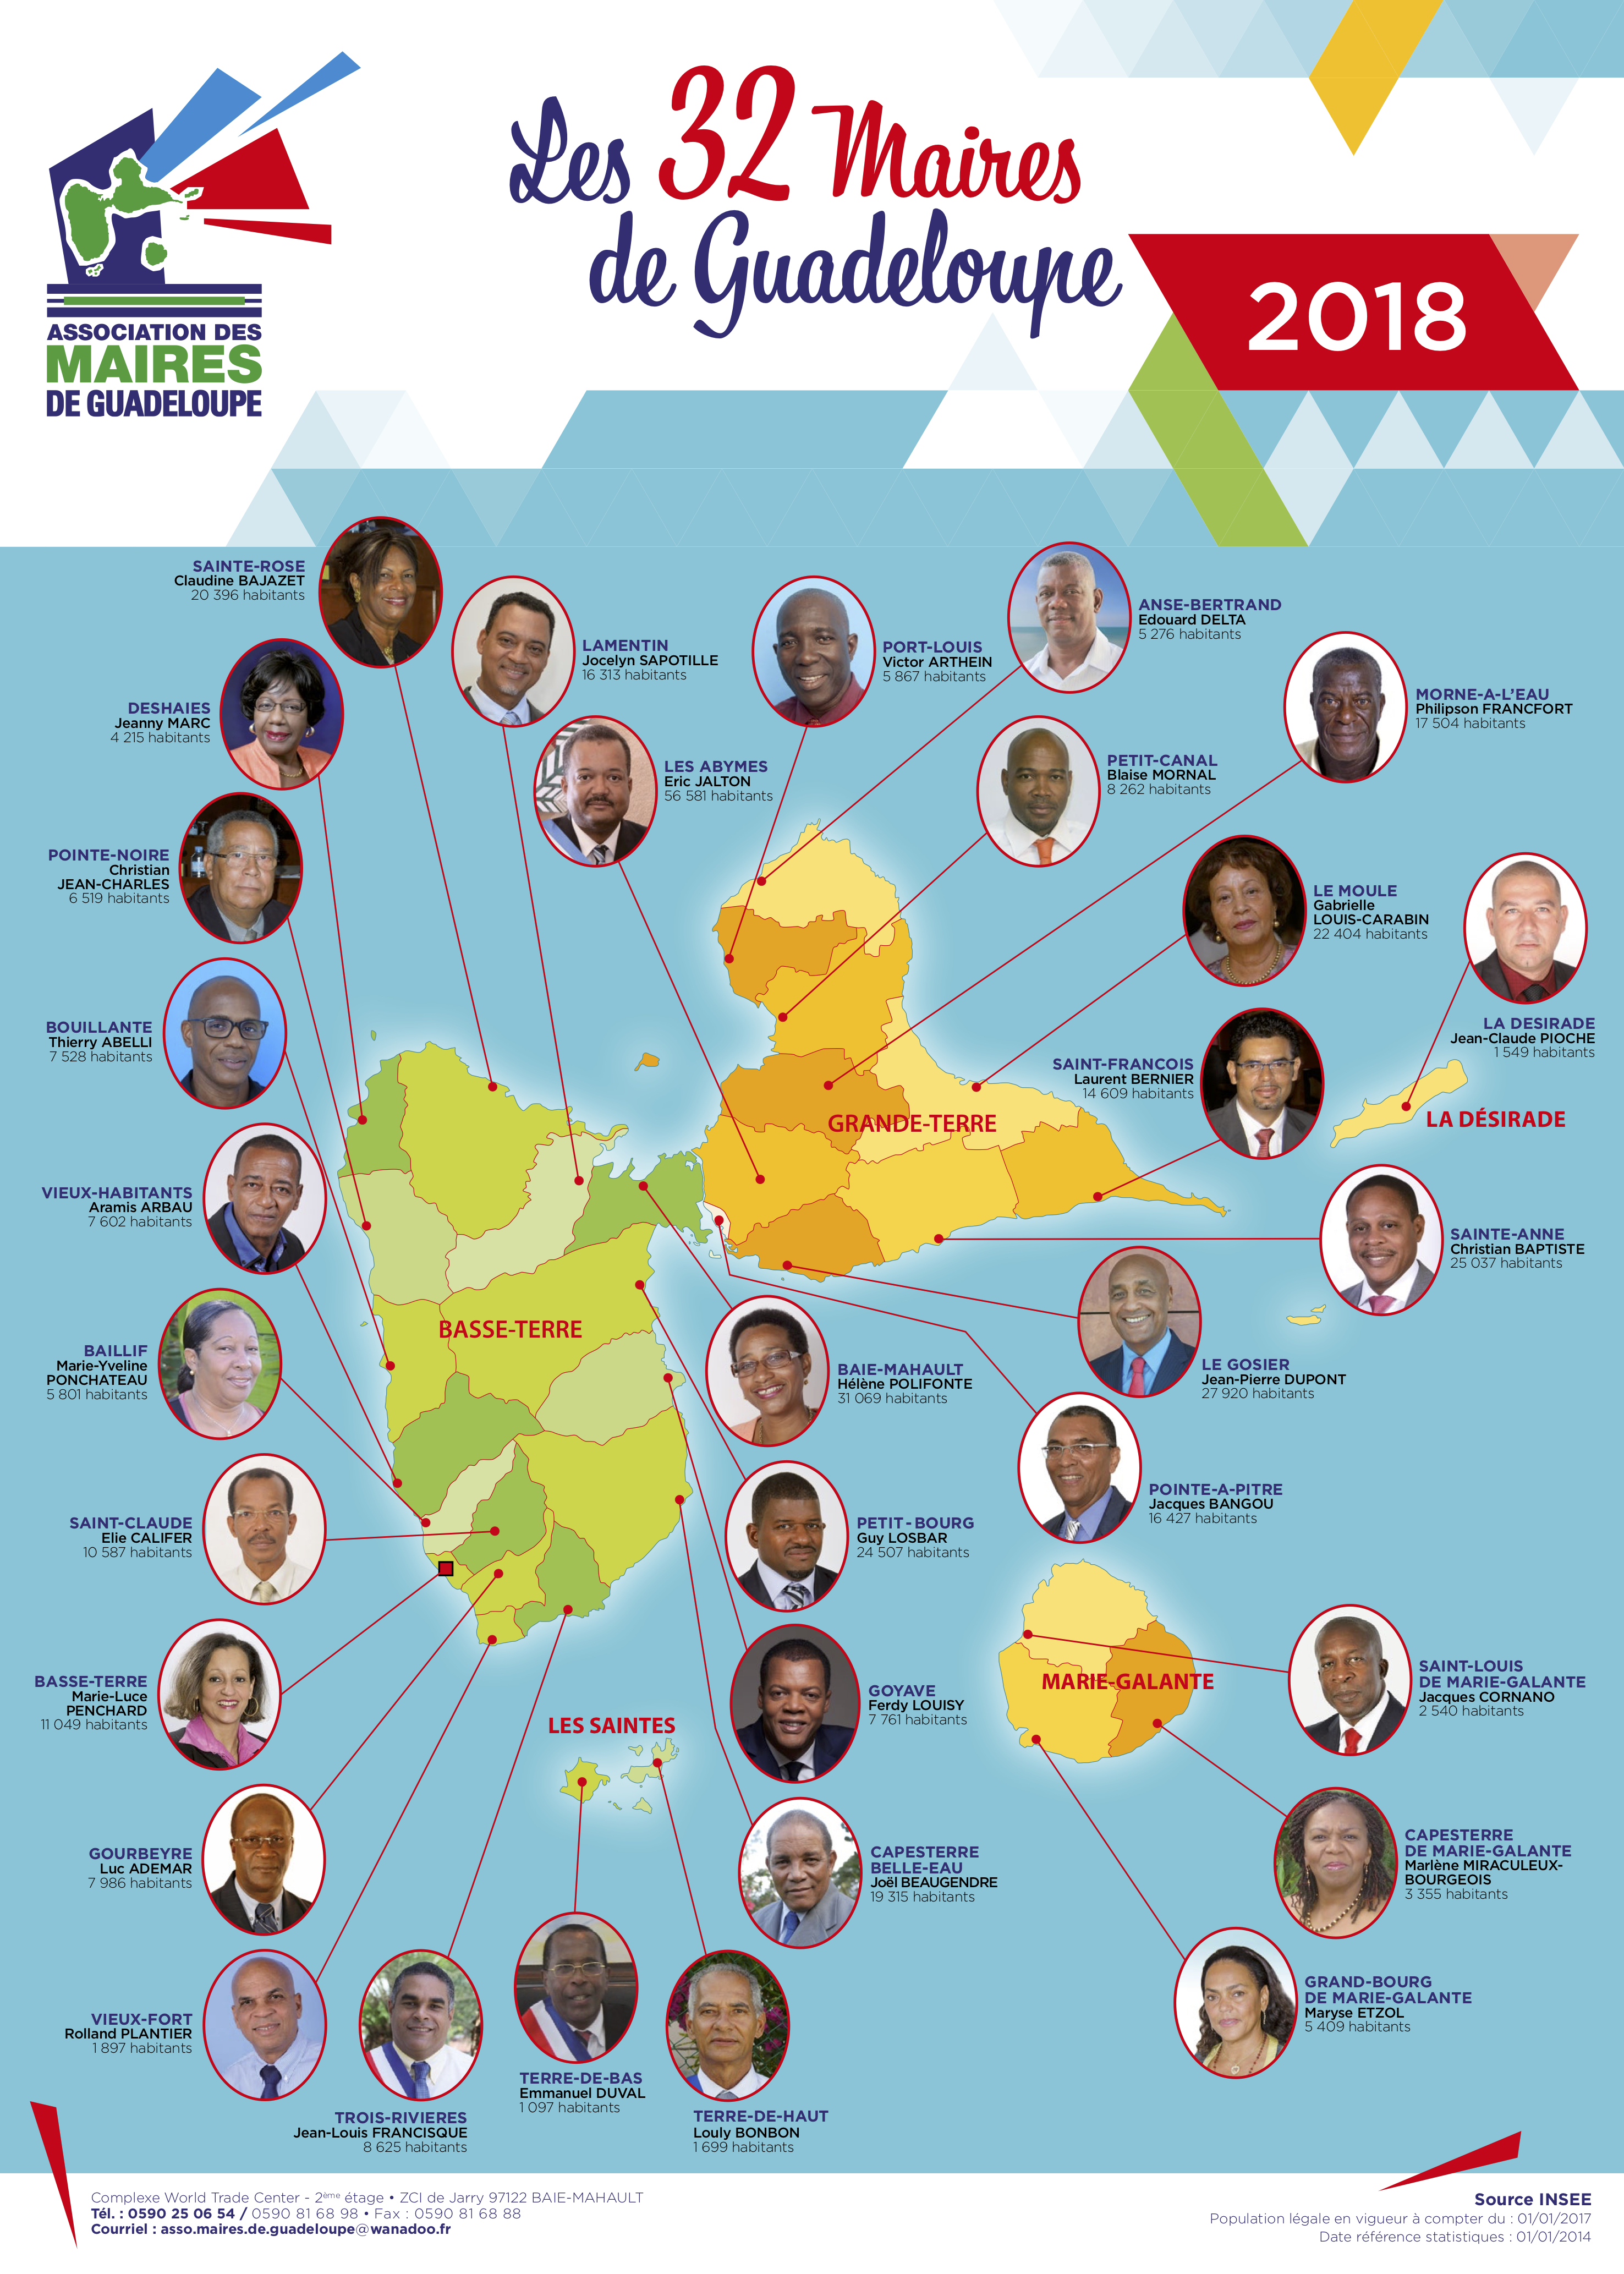 asso maires - affiche 50x70 - trombinoscope 2018 - bat2